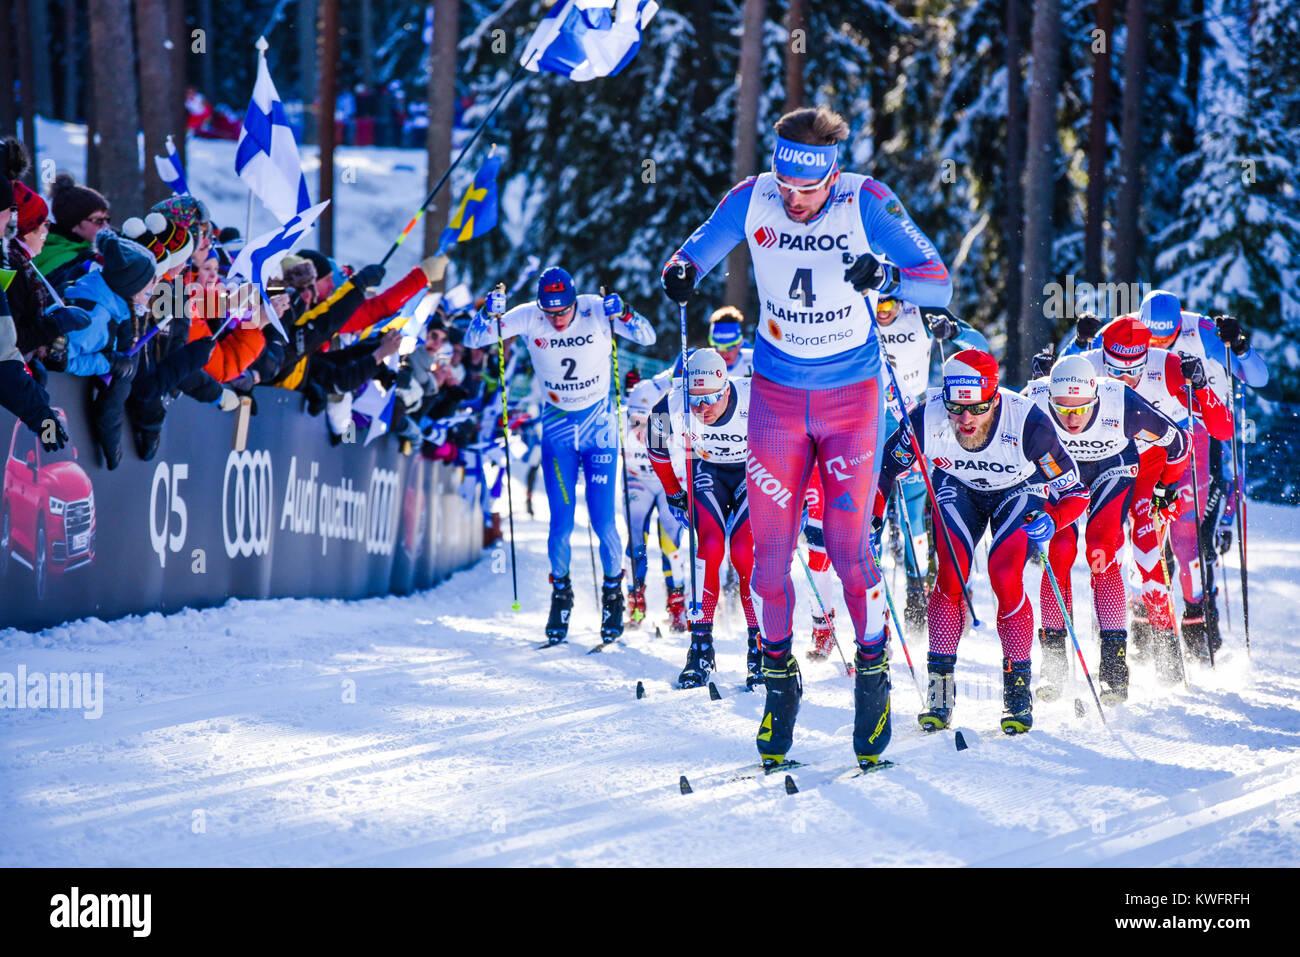 Russia's Sergey Ustiugov leads 30-k skiathlon (classic leg), Nordic World Ski Championships, Lahti, Finland, - Stock Image